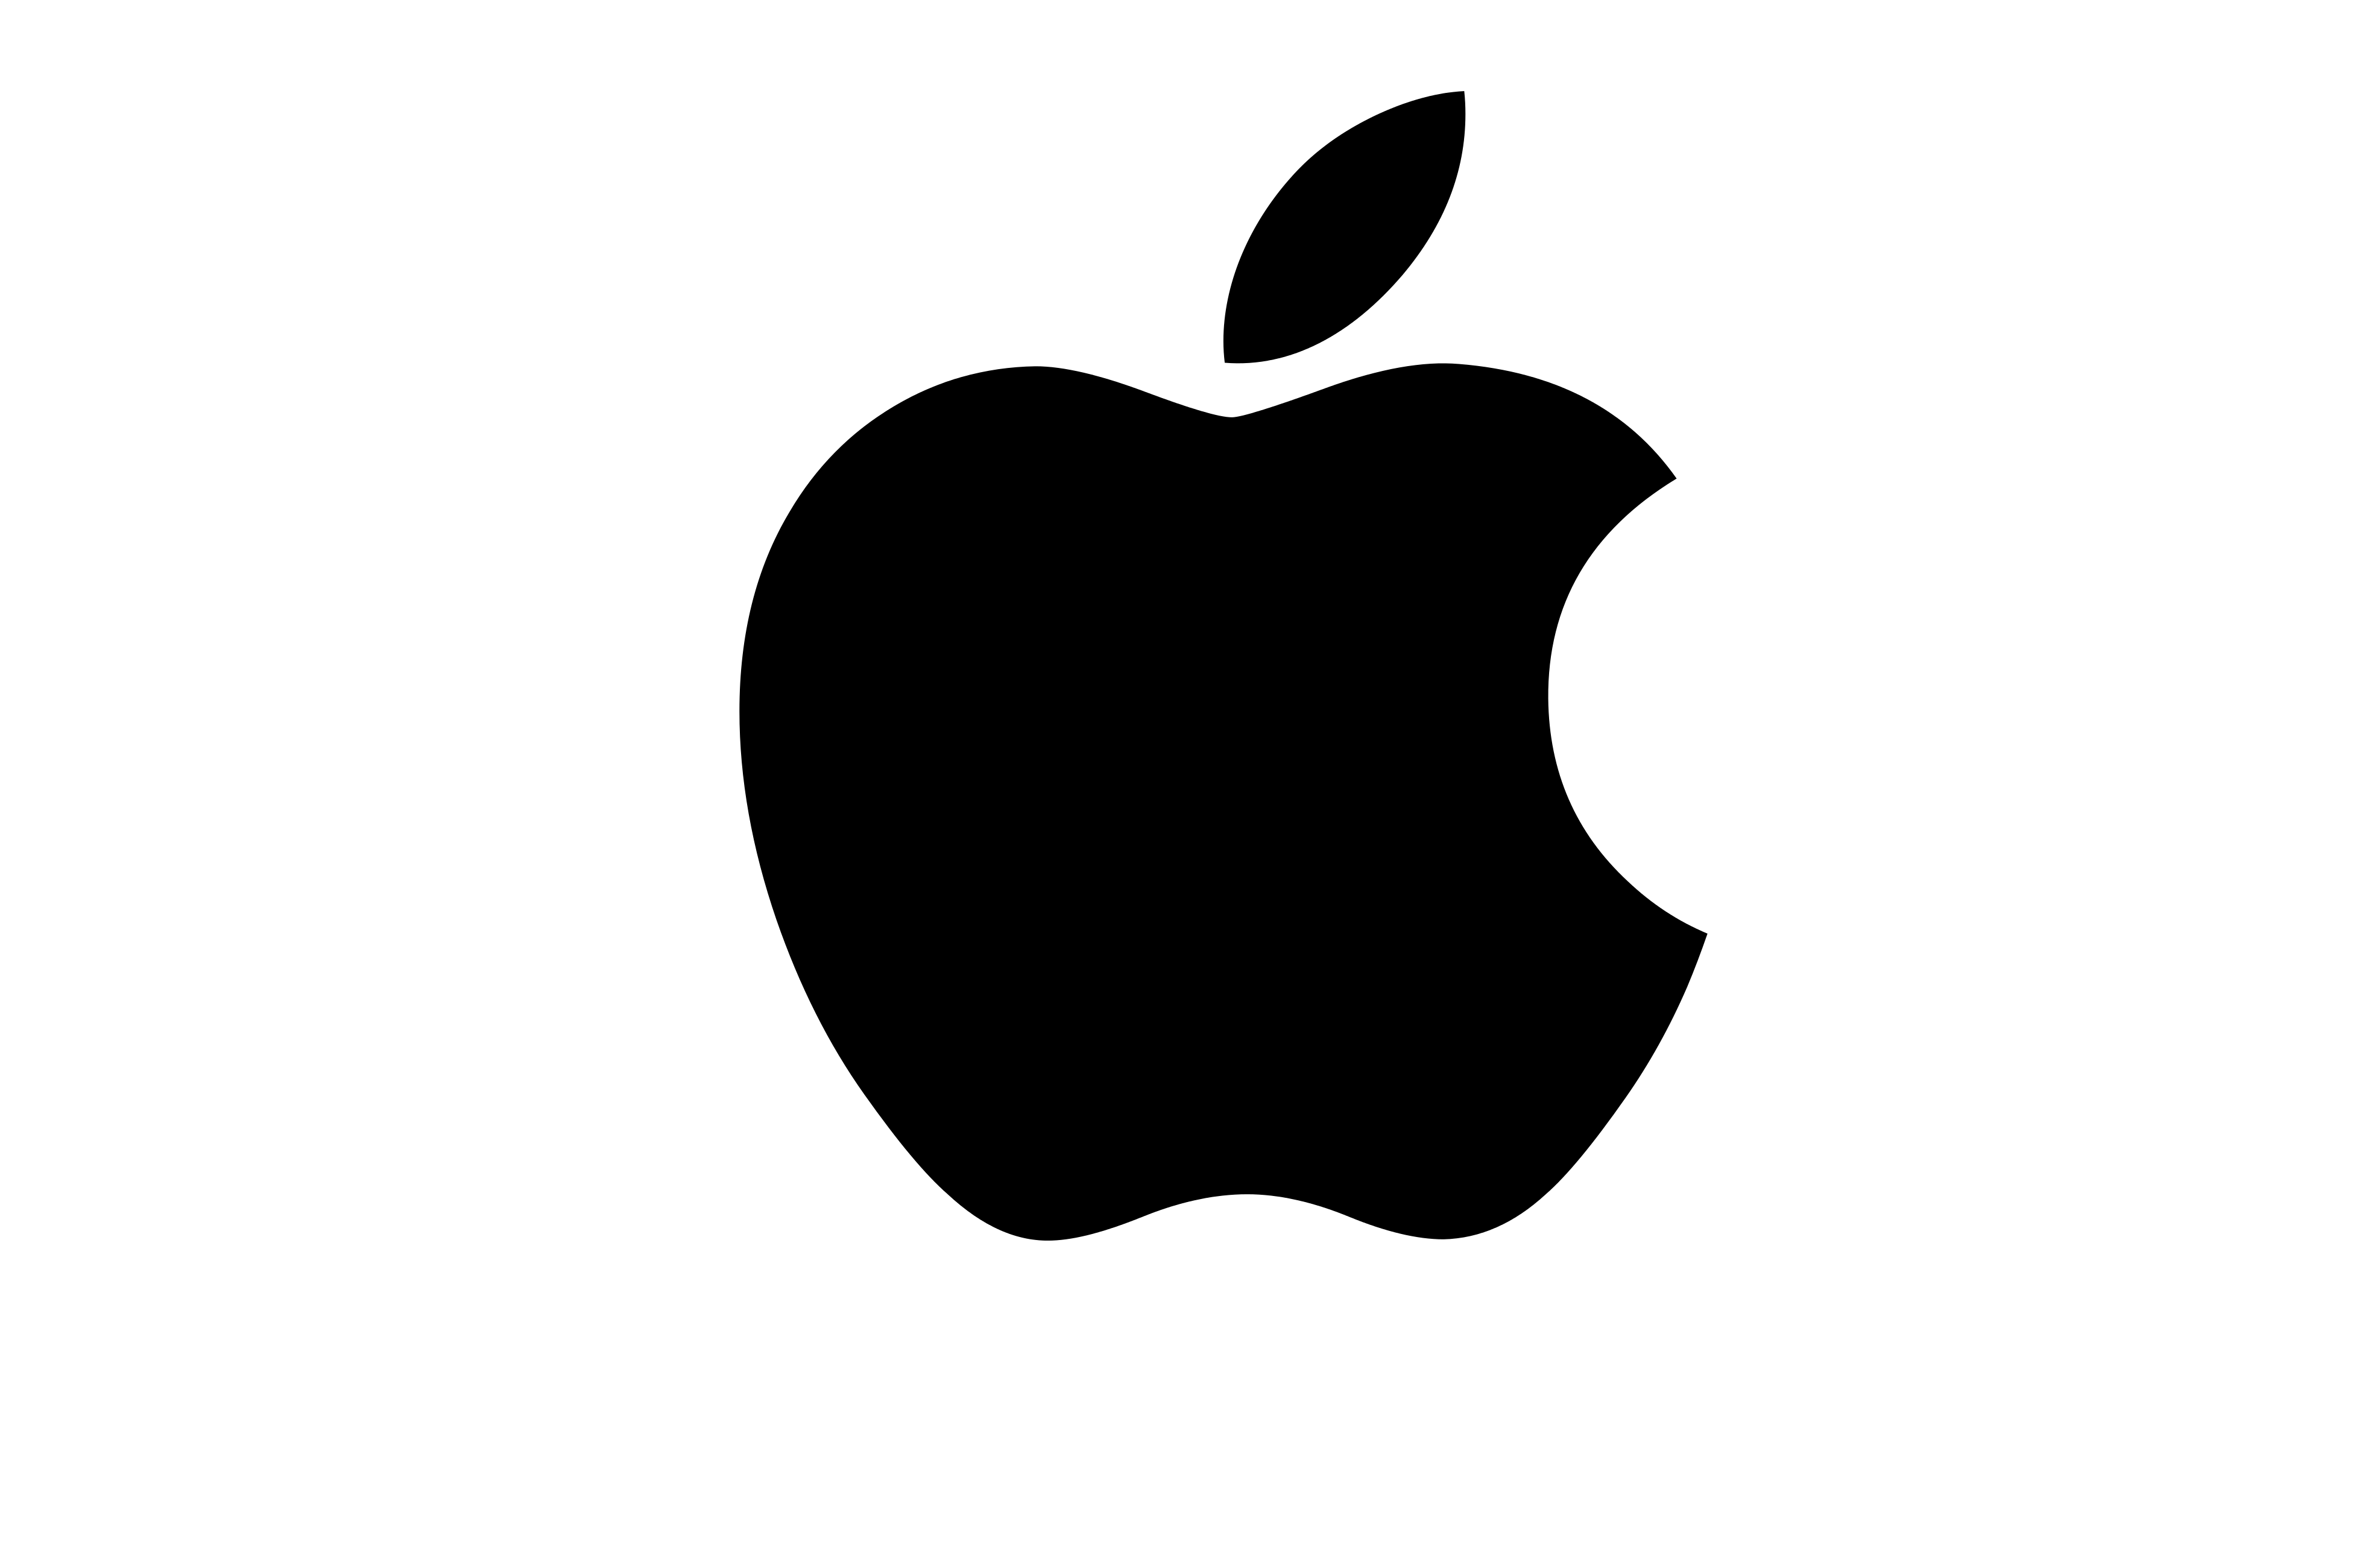 Computer icons clip art. Logo clipart apple